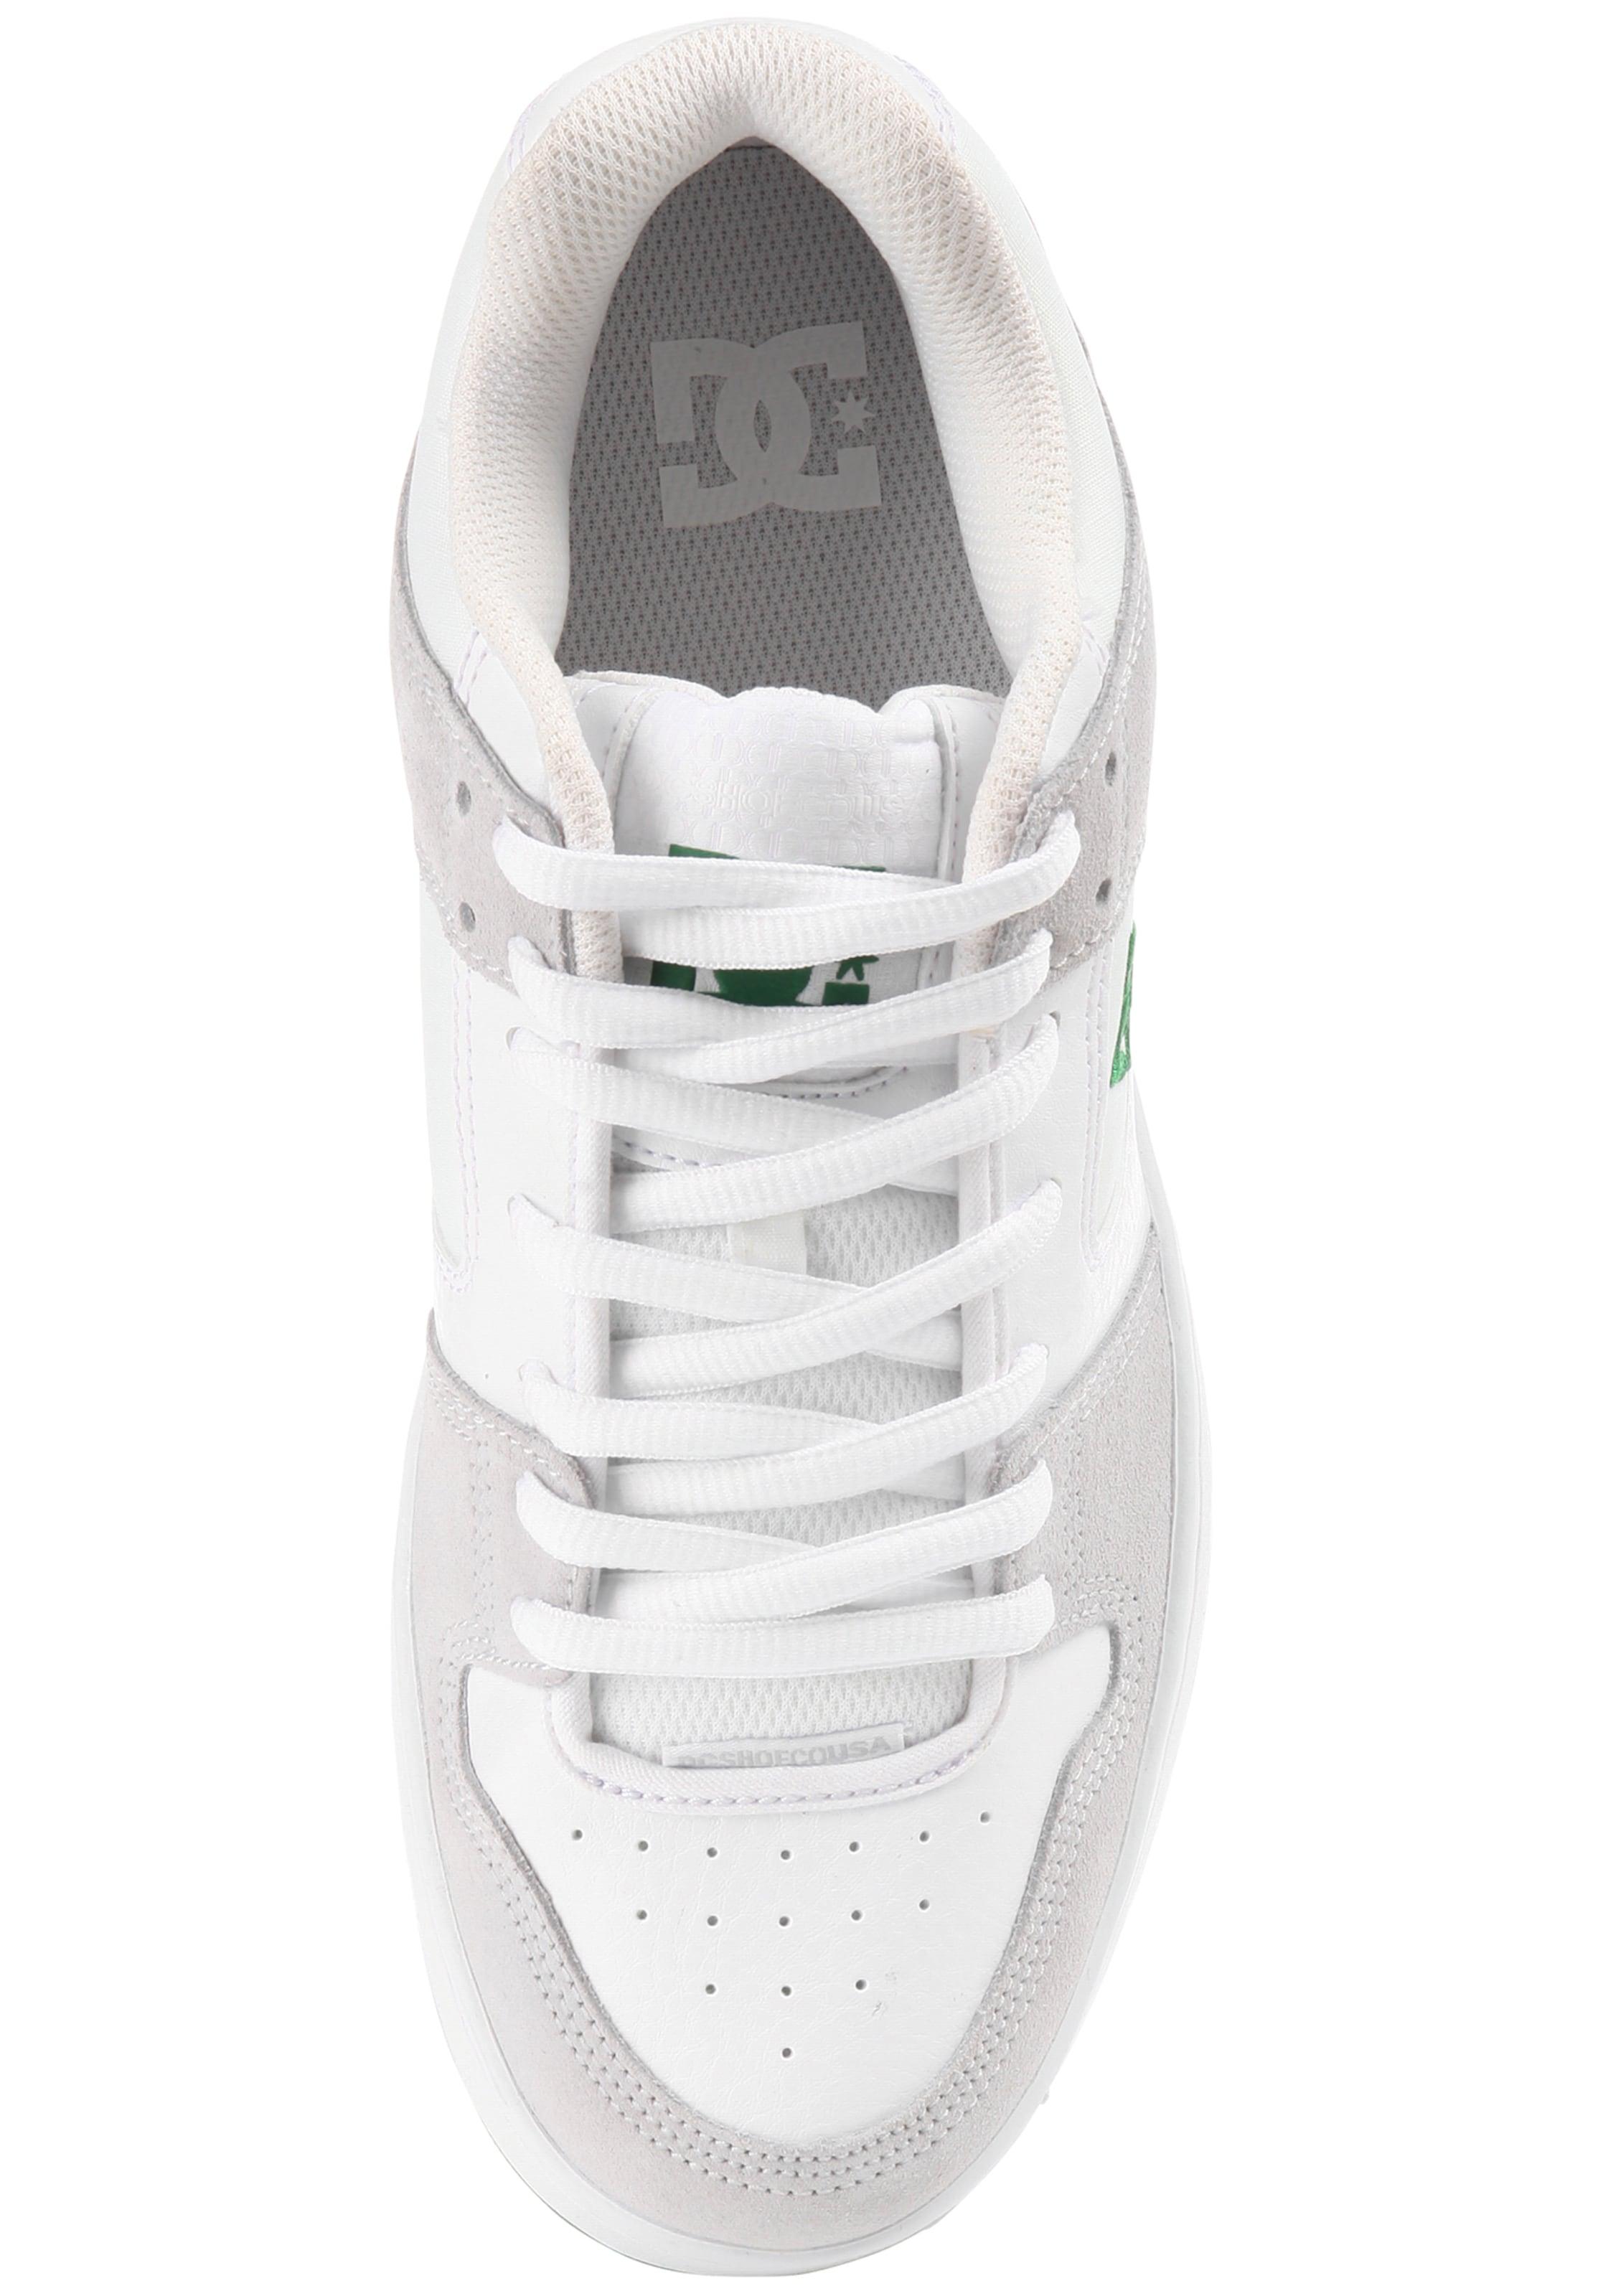 Dc 'manteca' GrünWeiß In Sneaker Shoes X0wO8Pnk